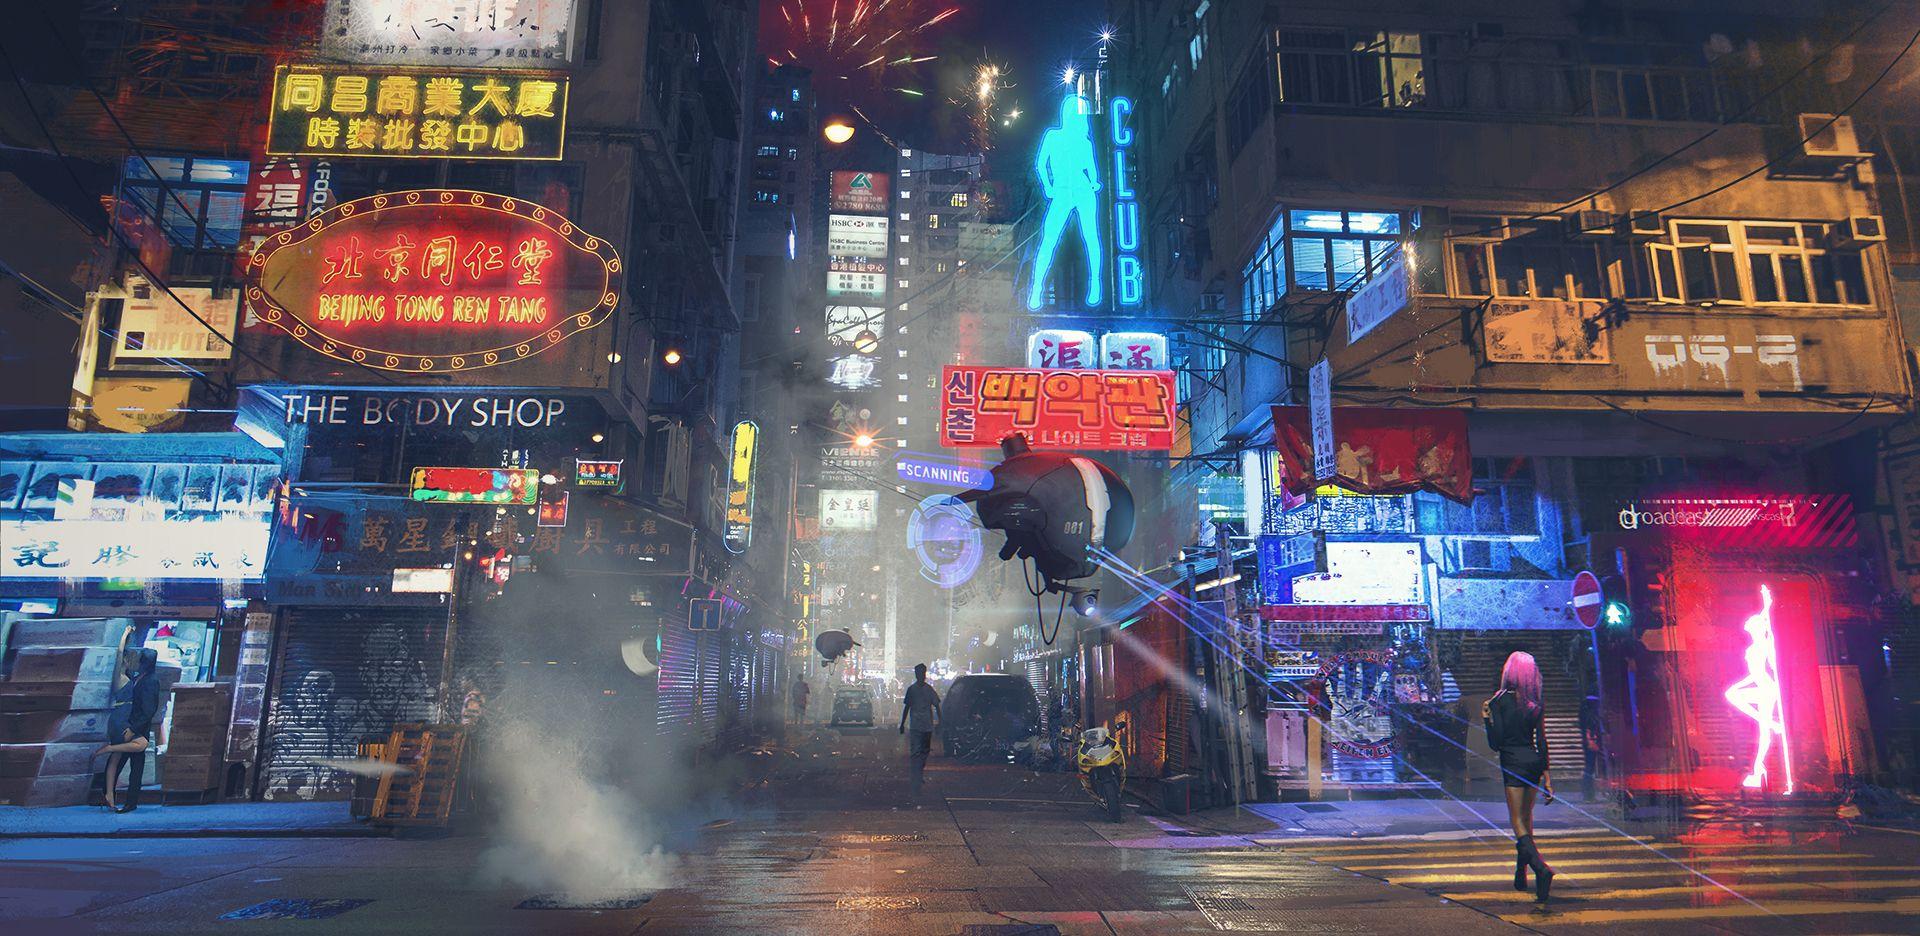 Neo Tokyo 1920x936 Futuristic City Cyberpunk Art Cyberpunk City